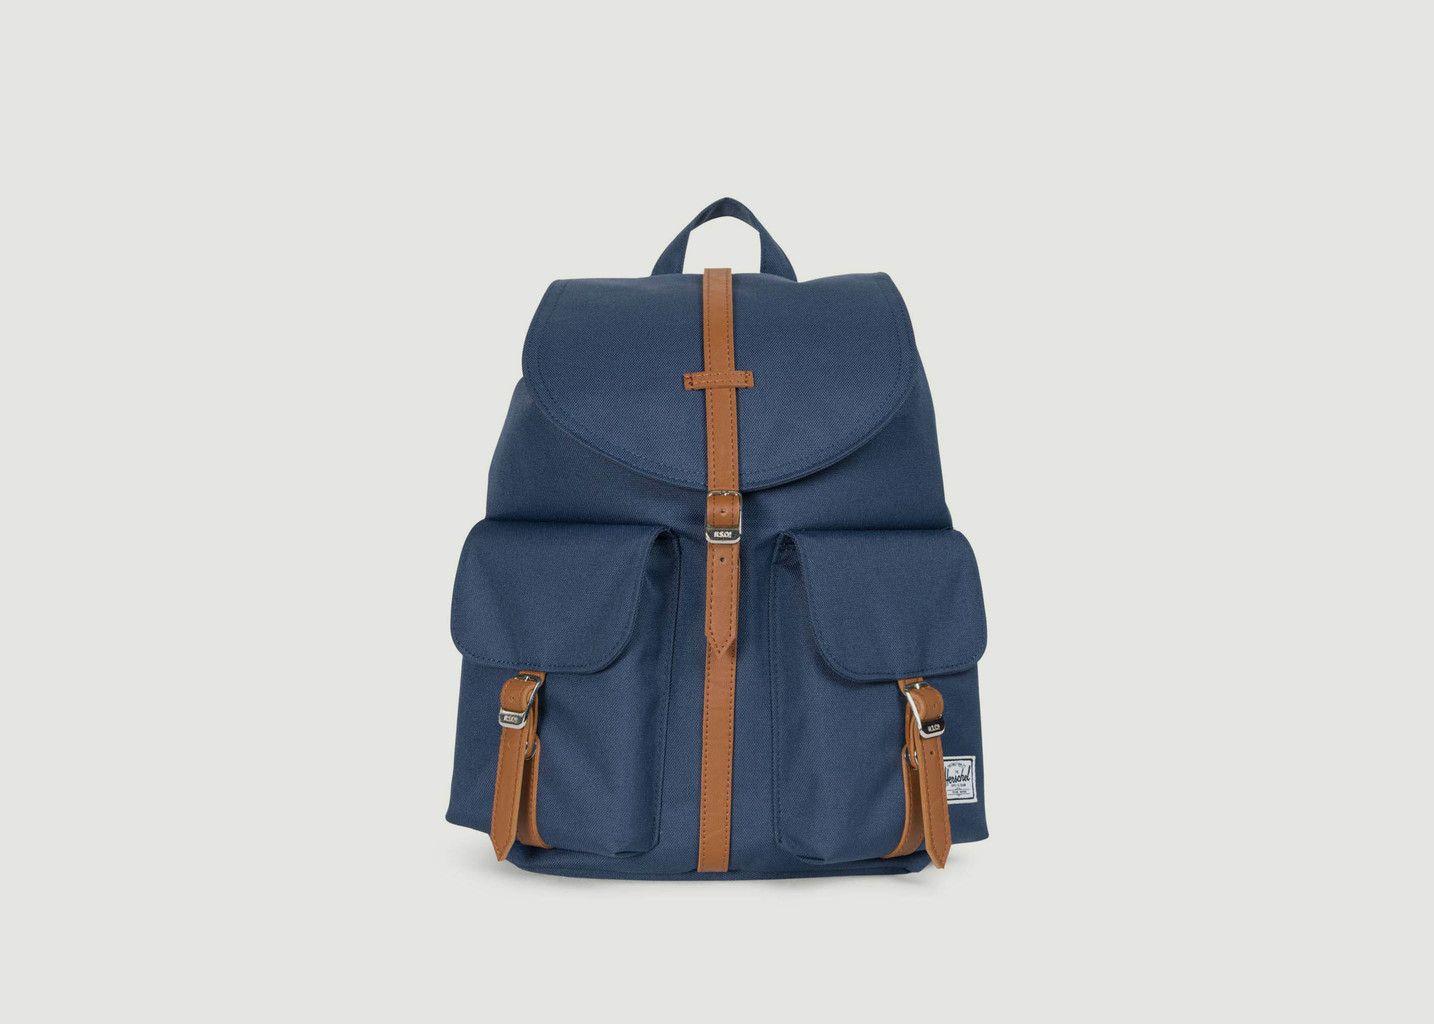 Dawson XS Backpack Navy Blue Herschel Supply Studio  6c28238fa75e8